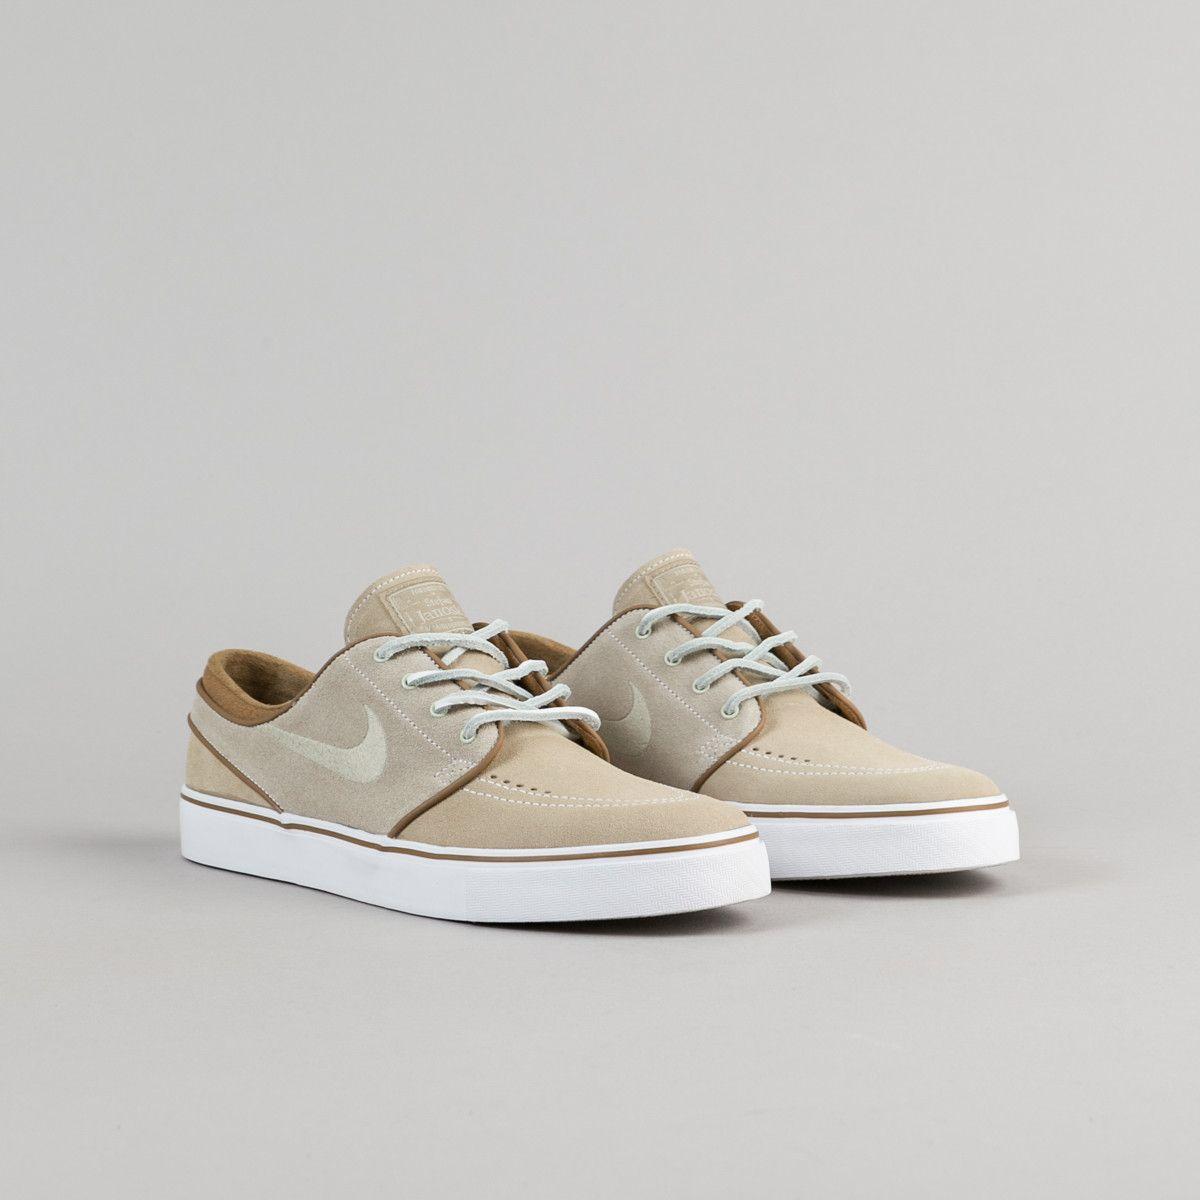 quality design 5e3f8 c7ef0 Nike SB Stefan Janoski OG Shoes - Reed / Reed - Stone - Rocky Tan ...